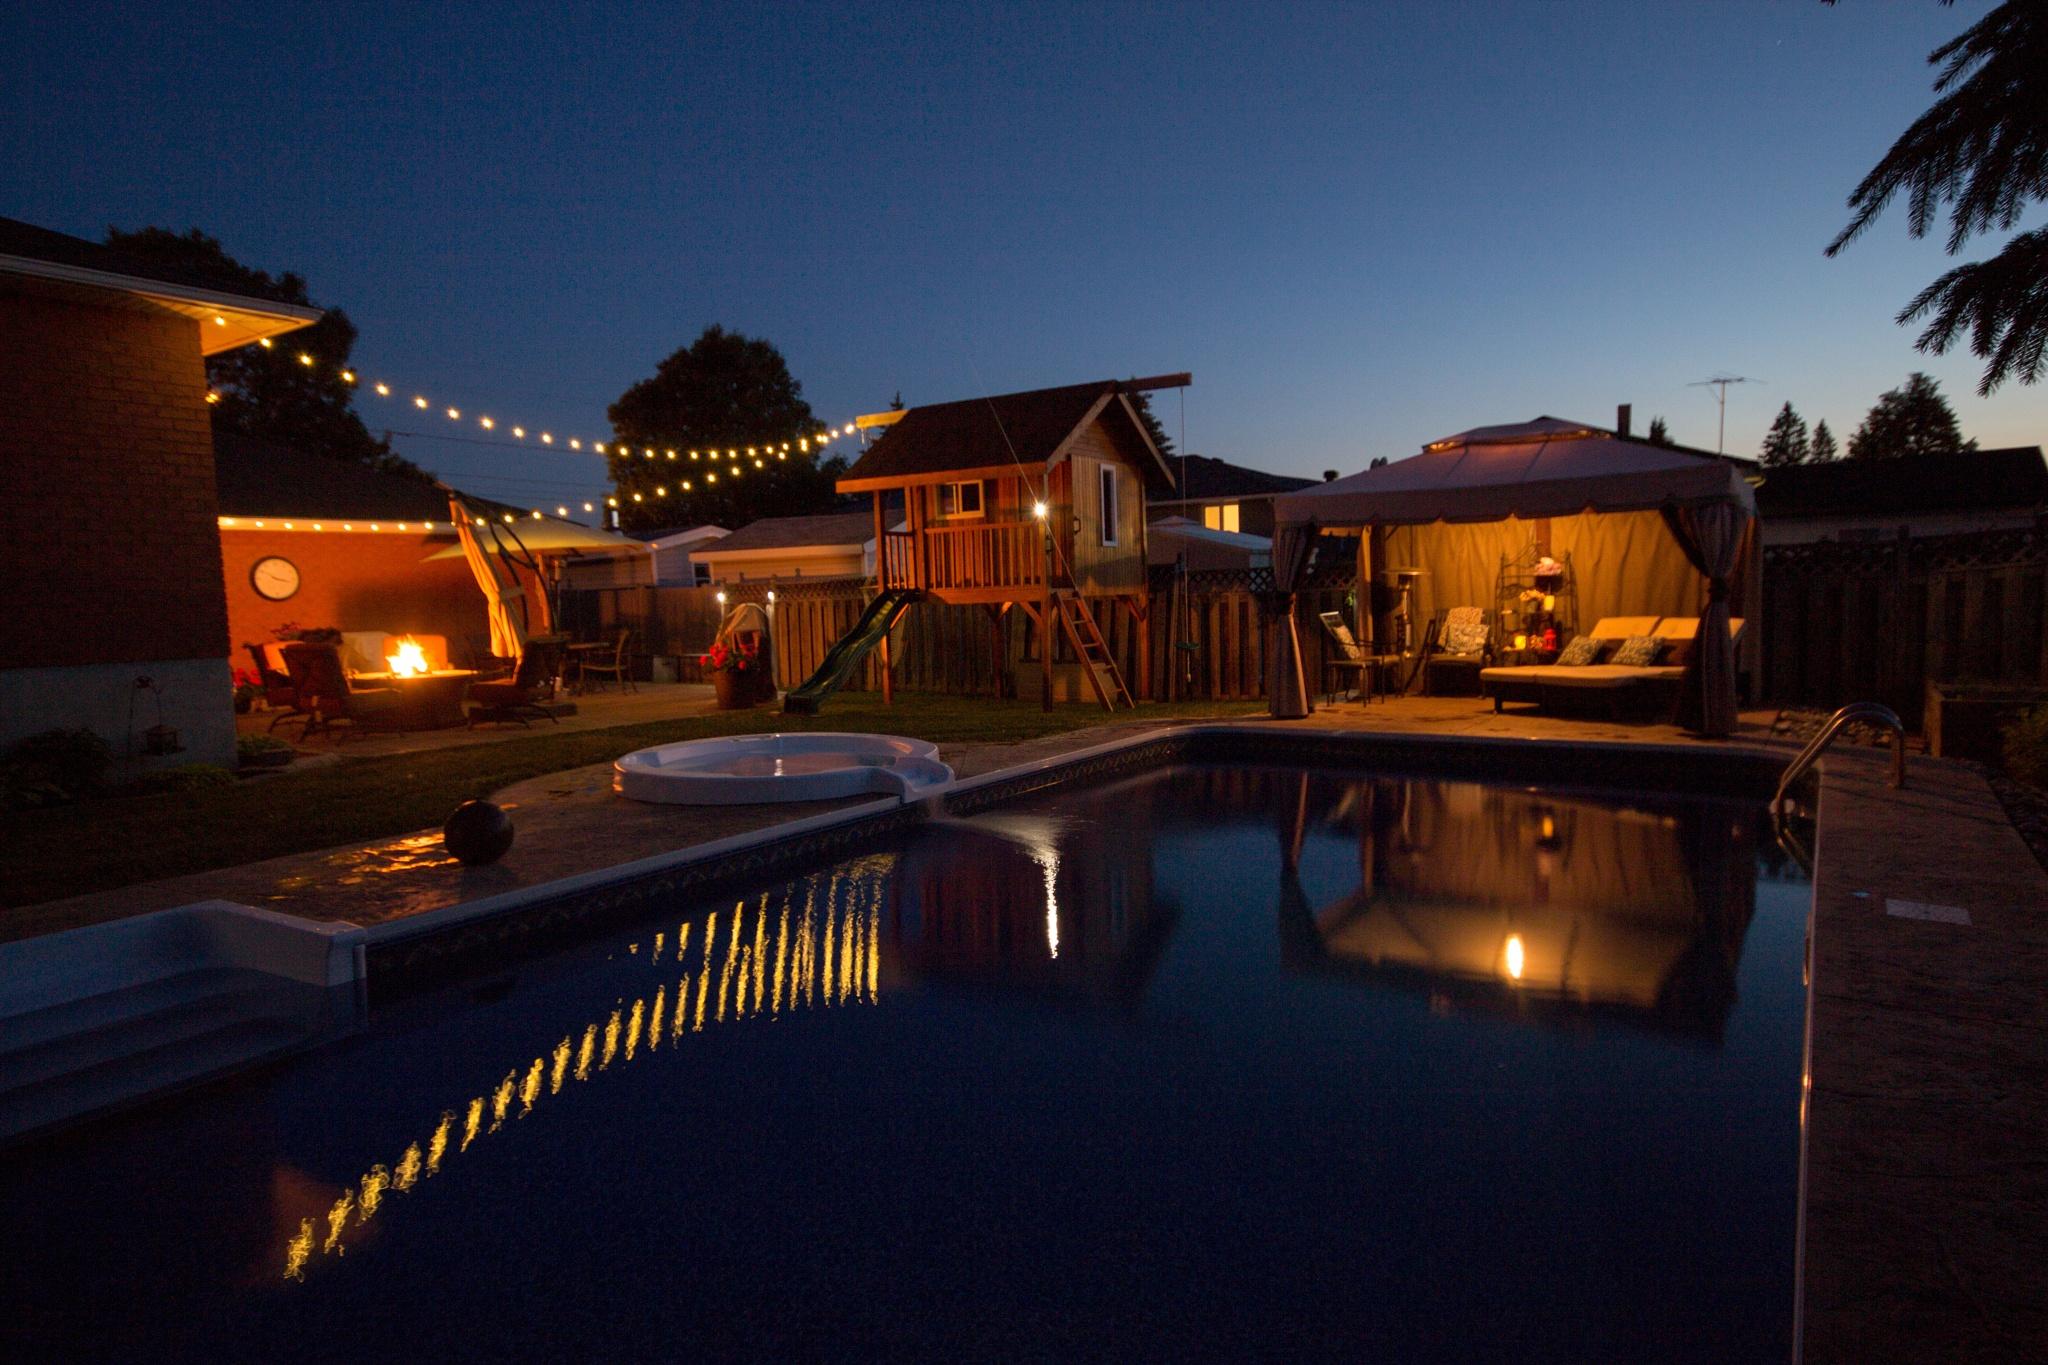 Backyard by danlandry69